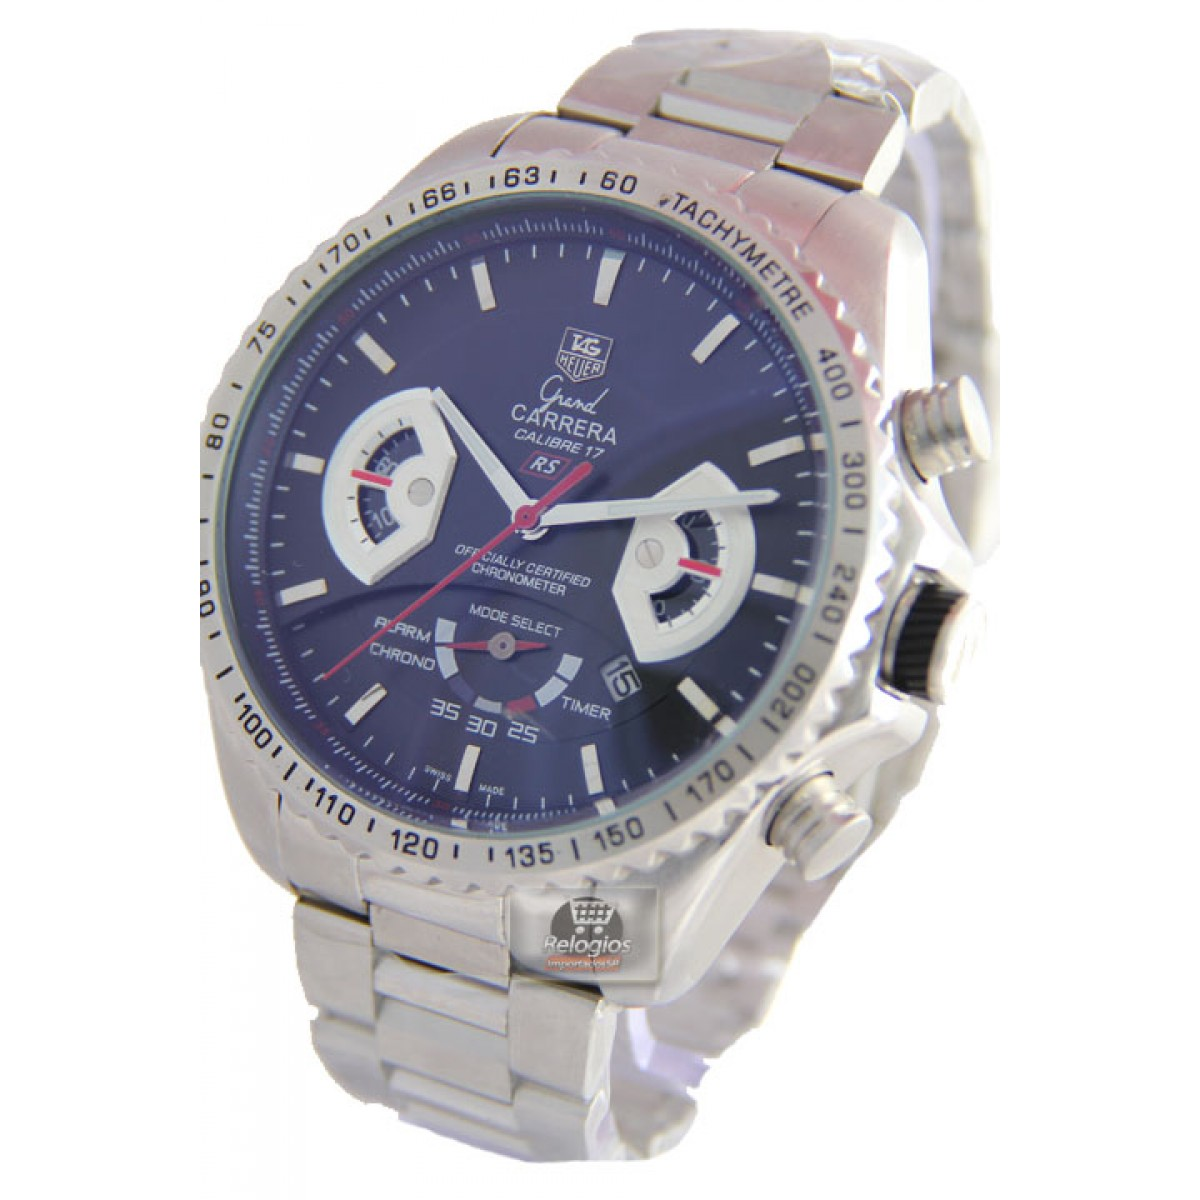 62149886eef Relógio Réplica Tag Heuer Grand Carrera 17 Rs3